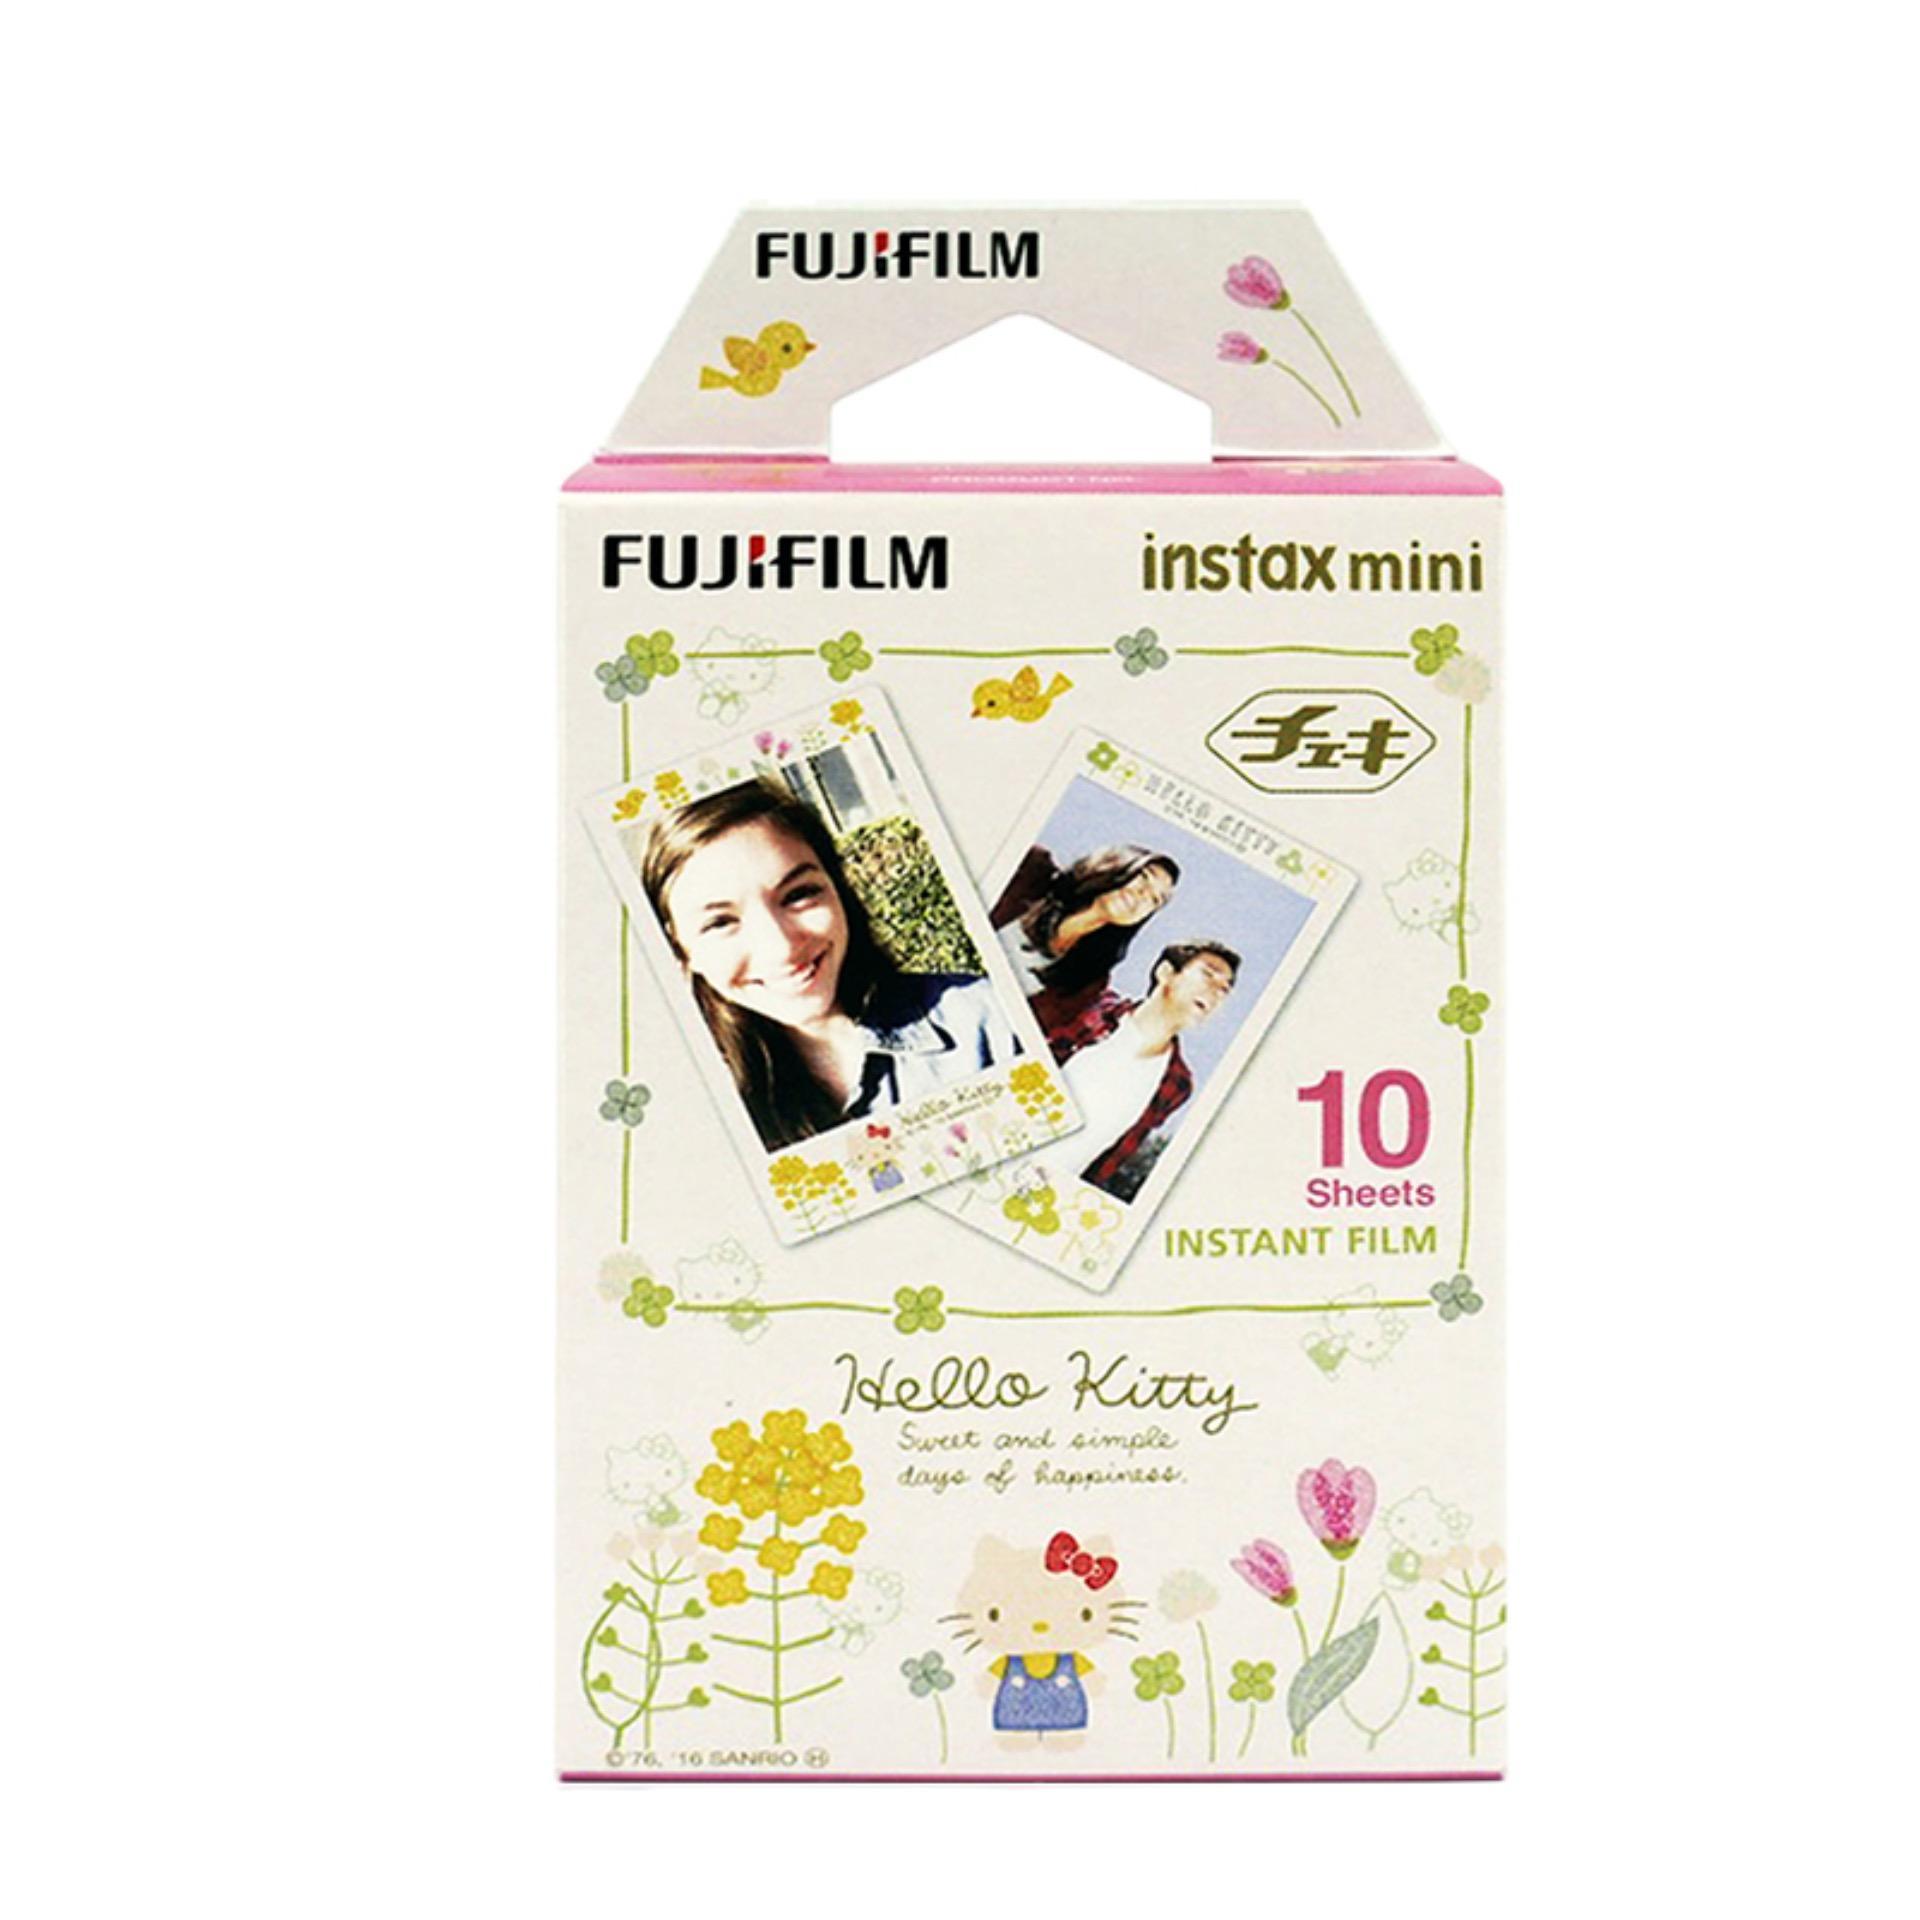 Fujifilm Instax Mini Hello Kitty Sweet Time Films – 10 Sheets